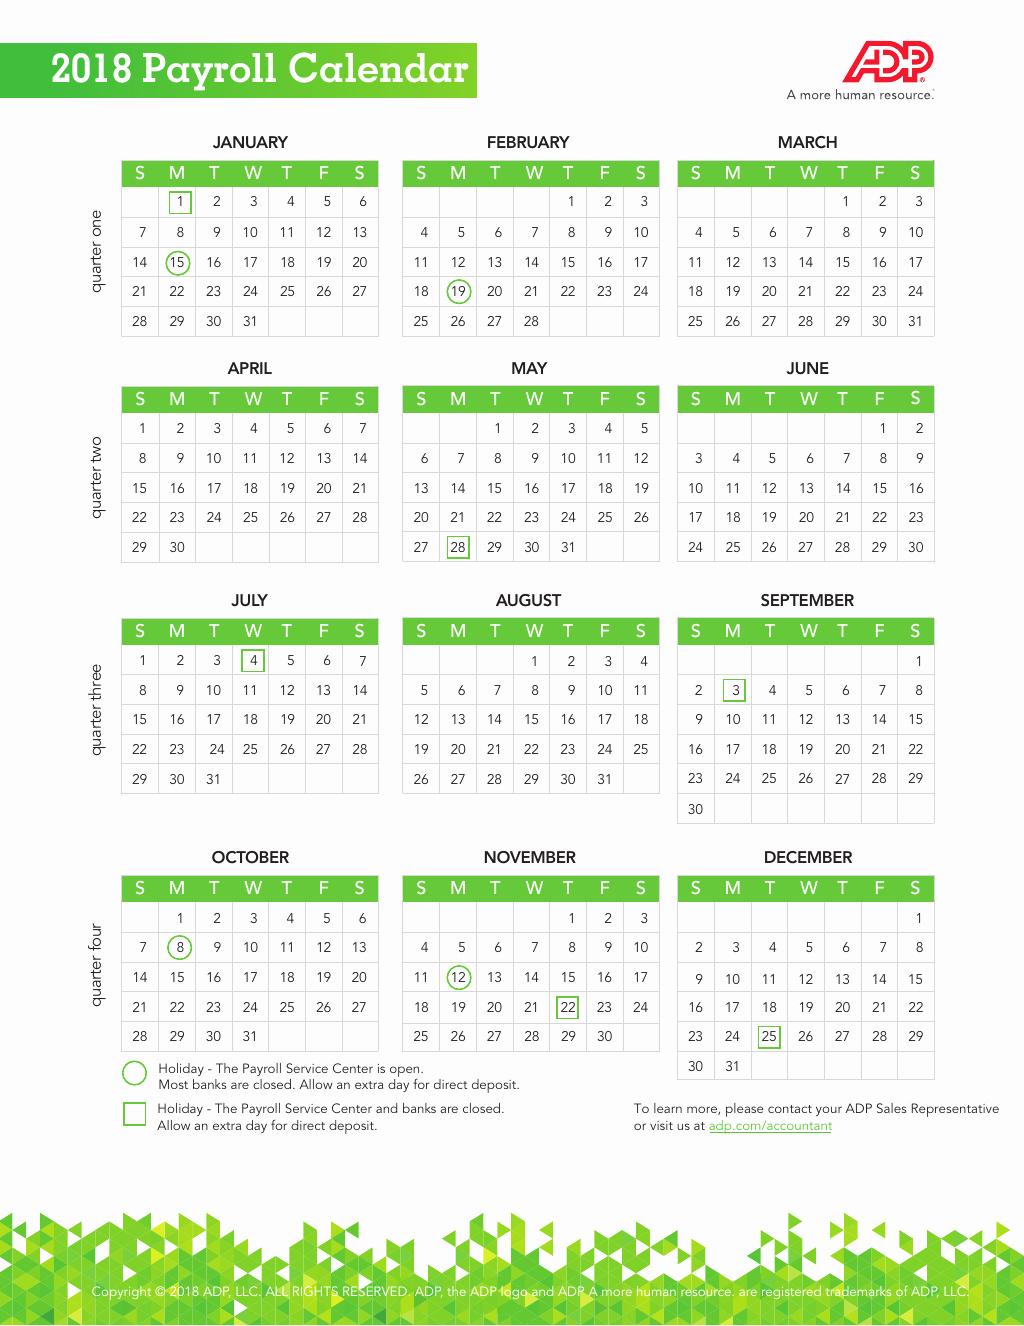 2019 Payroll Calendar Template Awesome Adp Biweekly Payroll Calendar 2019